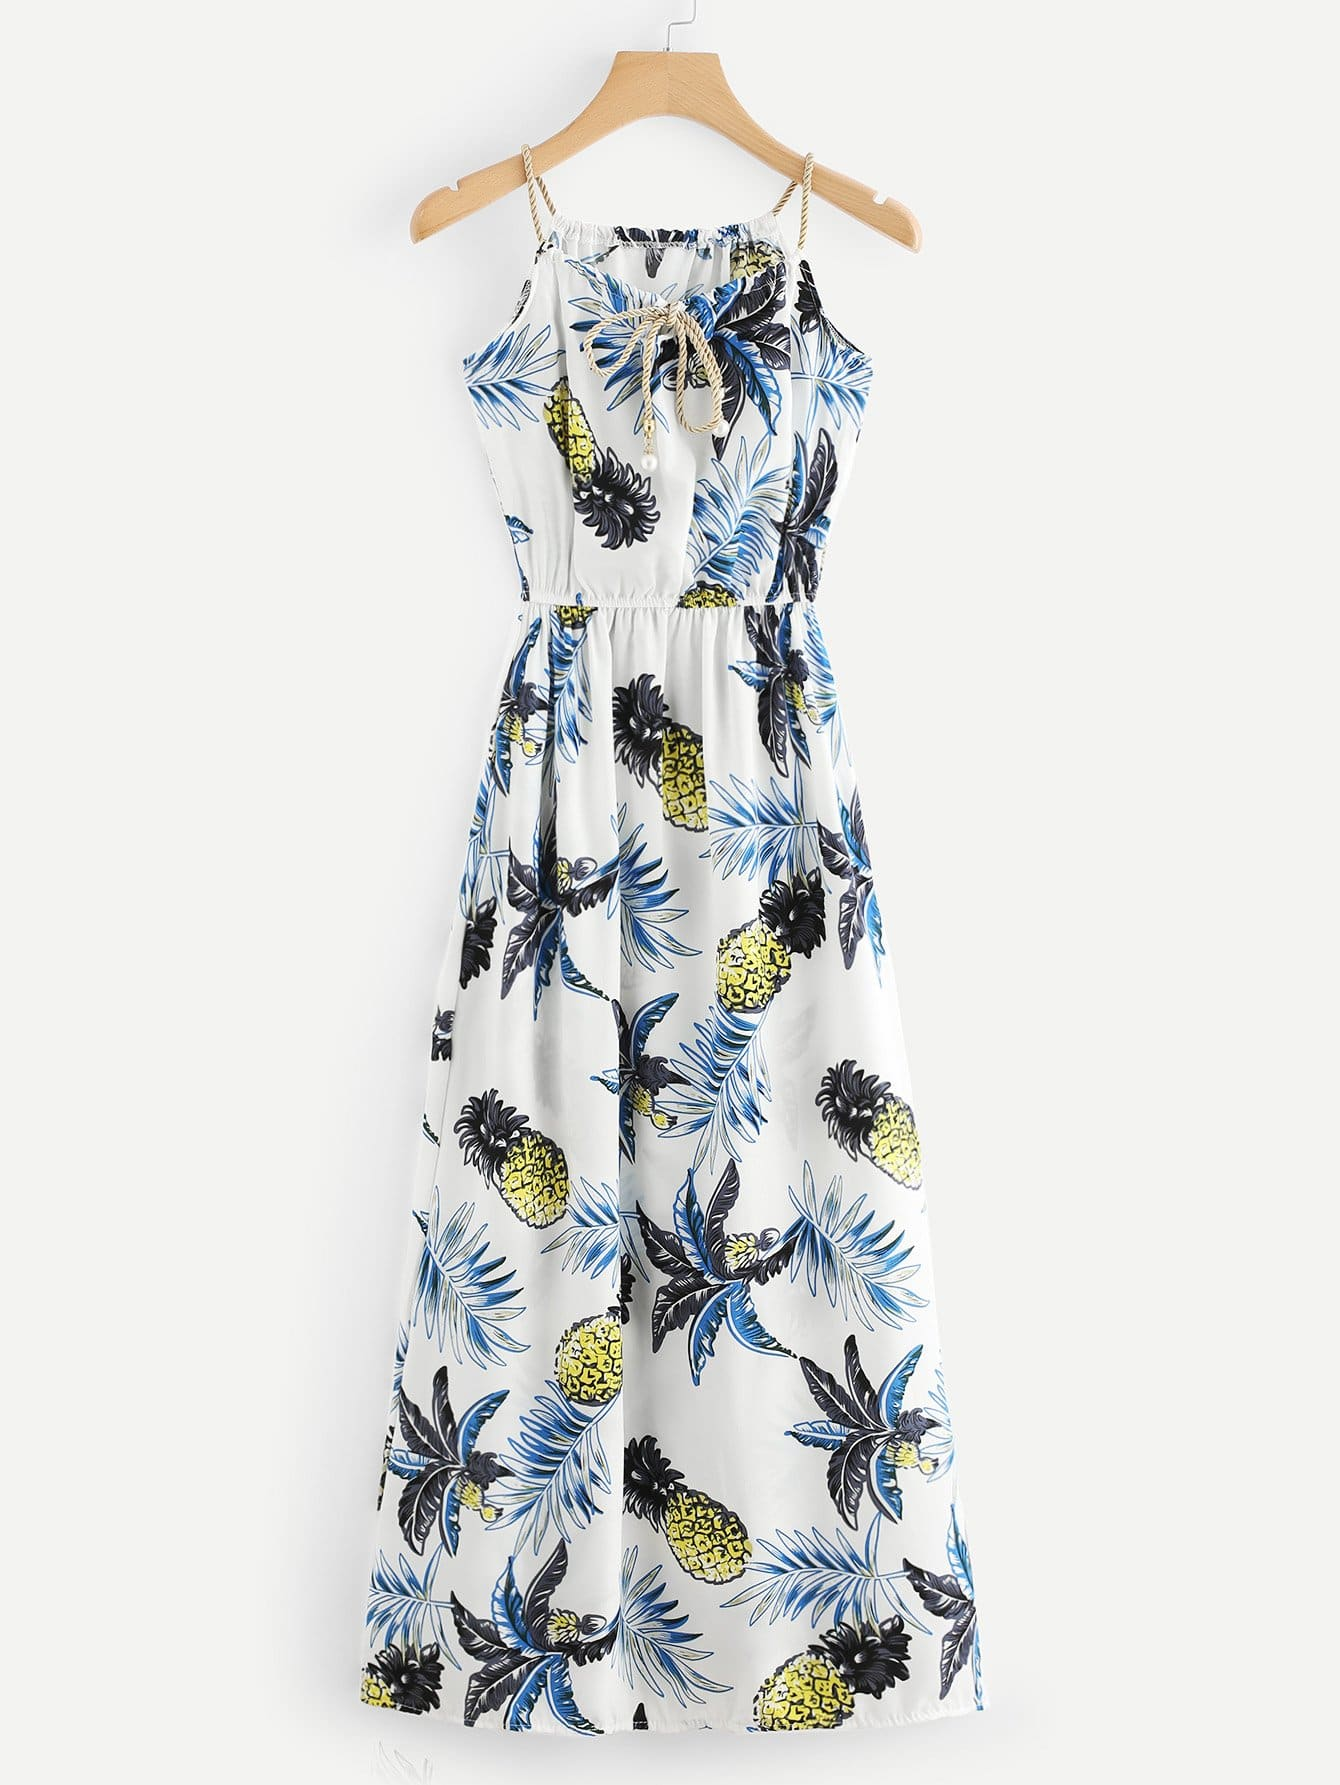 Pineapple Print Faux Pearl Detail Cami Dress